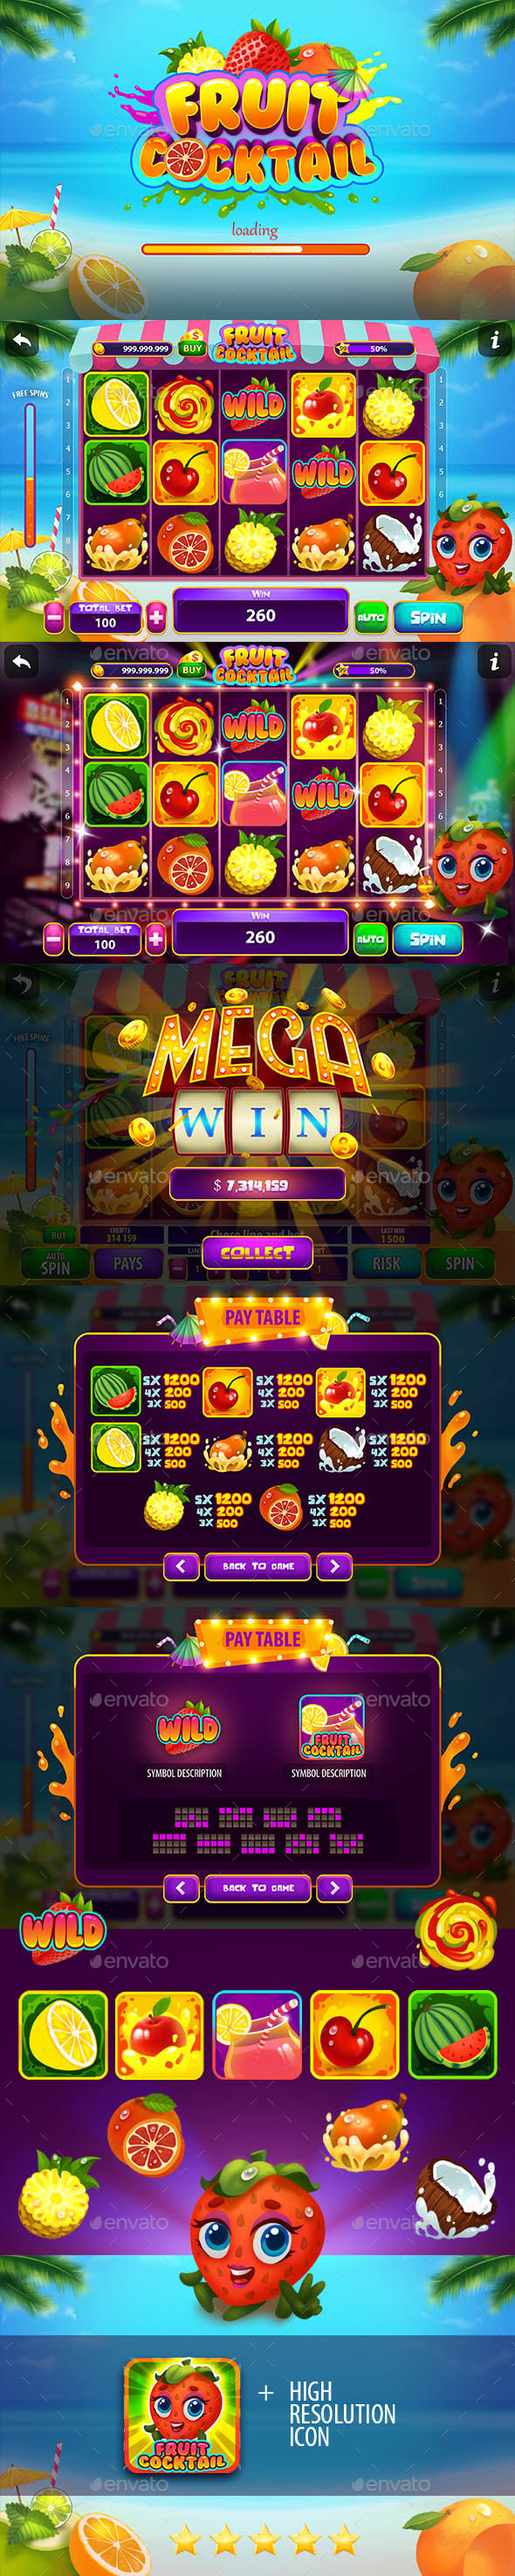 Fruit Cocktail Slot Game Kit - Game Kits Game Assets